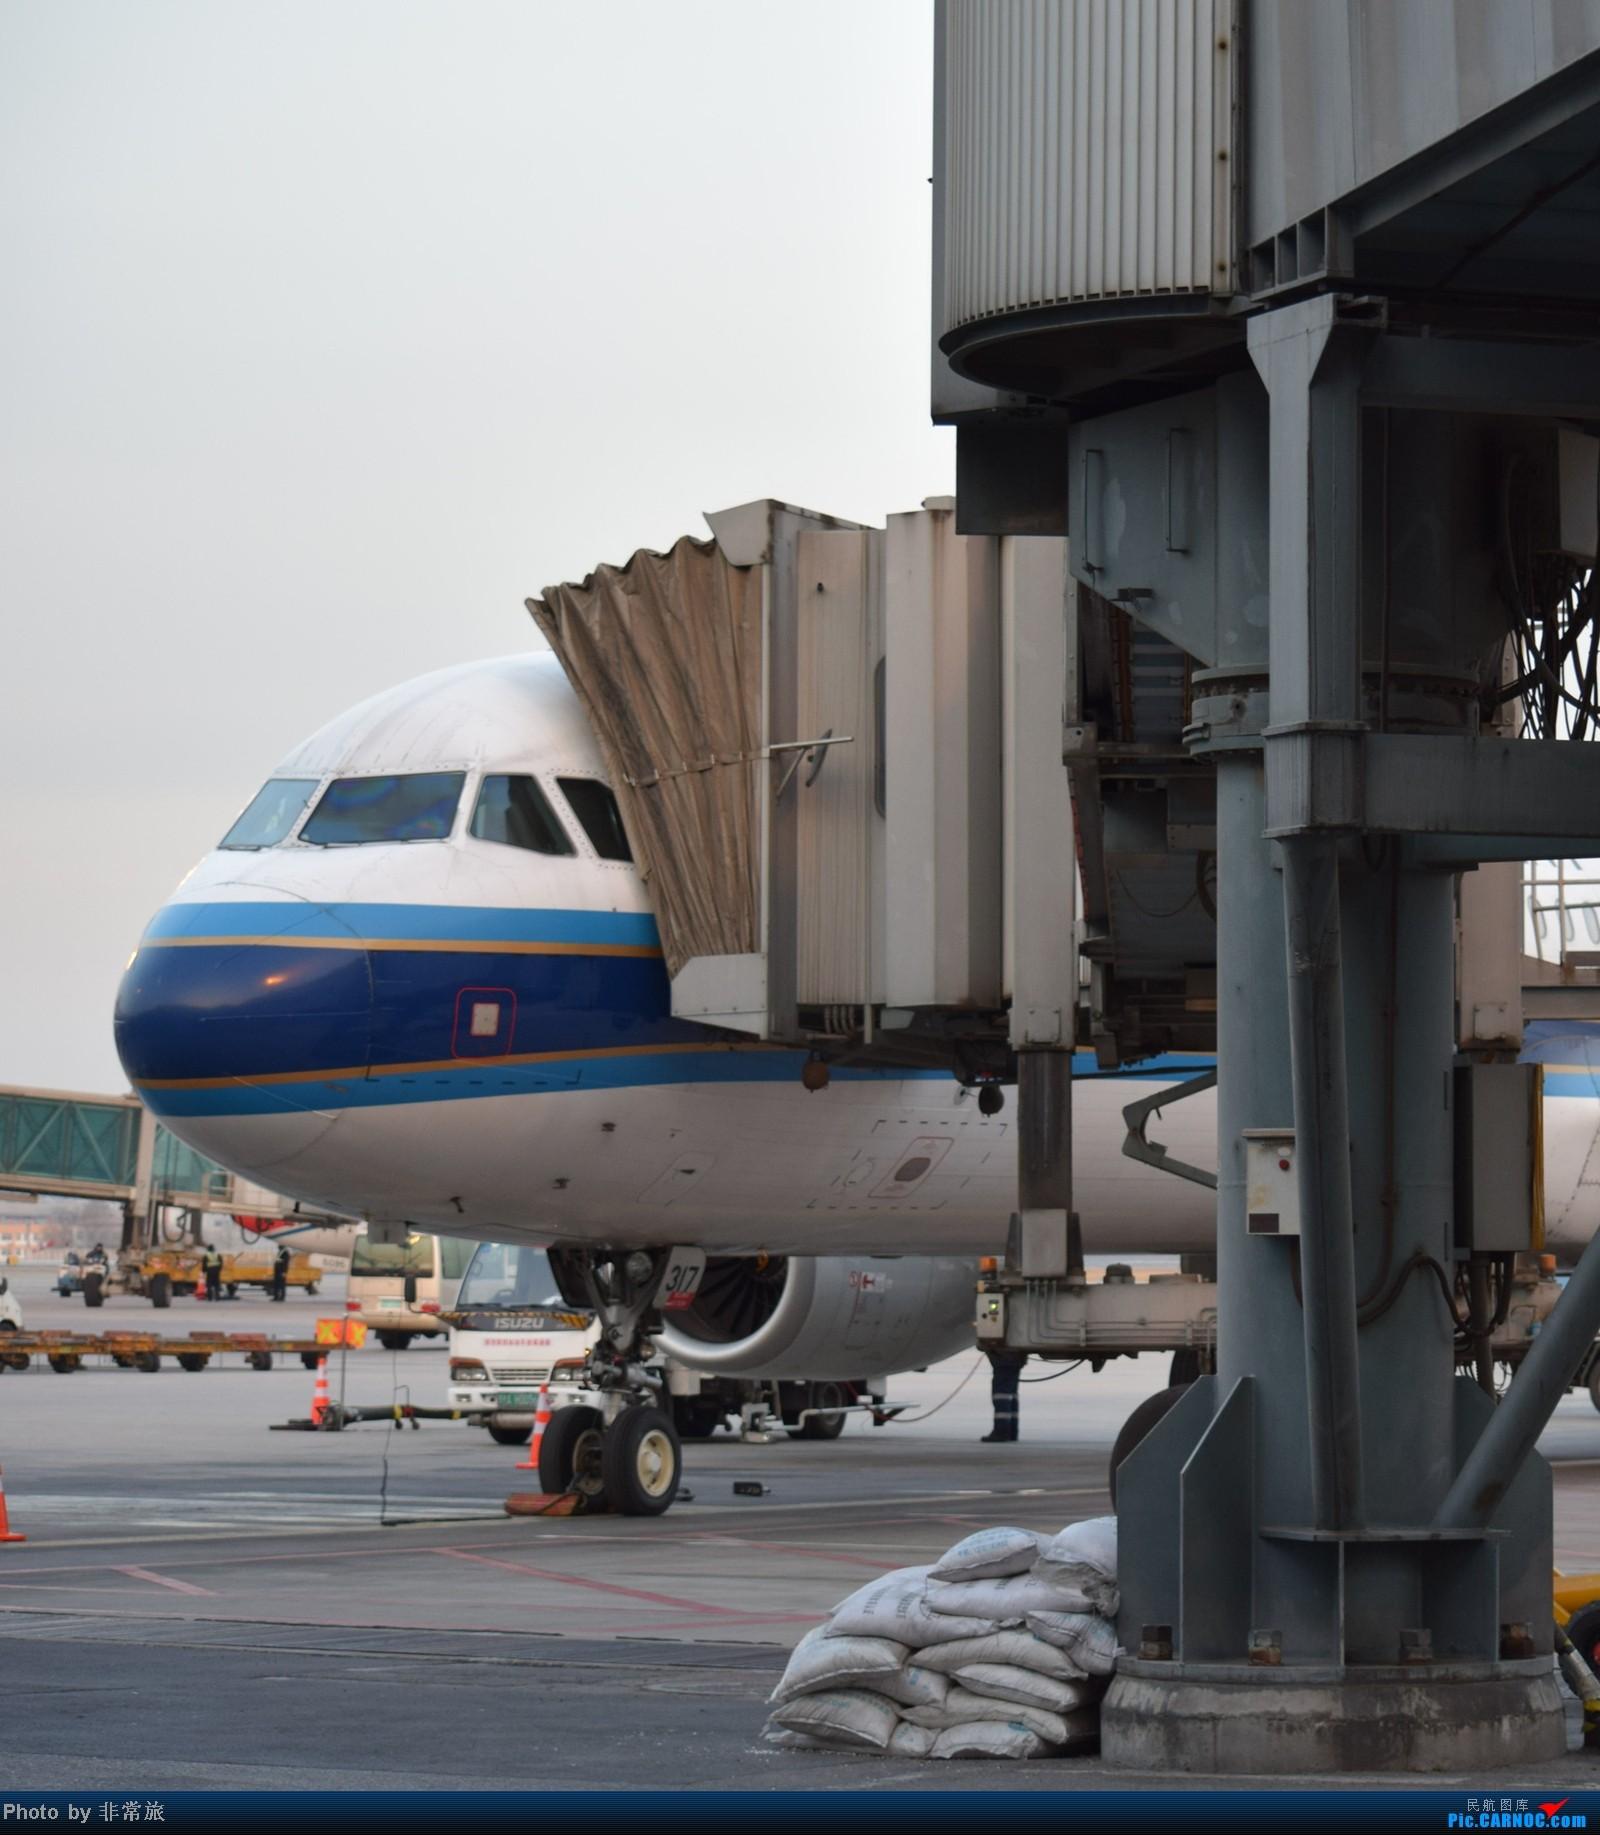 Re:[原创]大年三十除夕夜,三万英尺云霄间。 AIRBUS A330 HL-8259 中国北京首都机场 中国北京首都机场